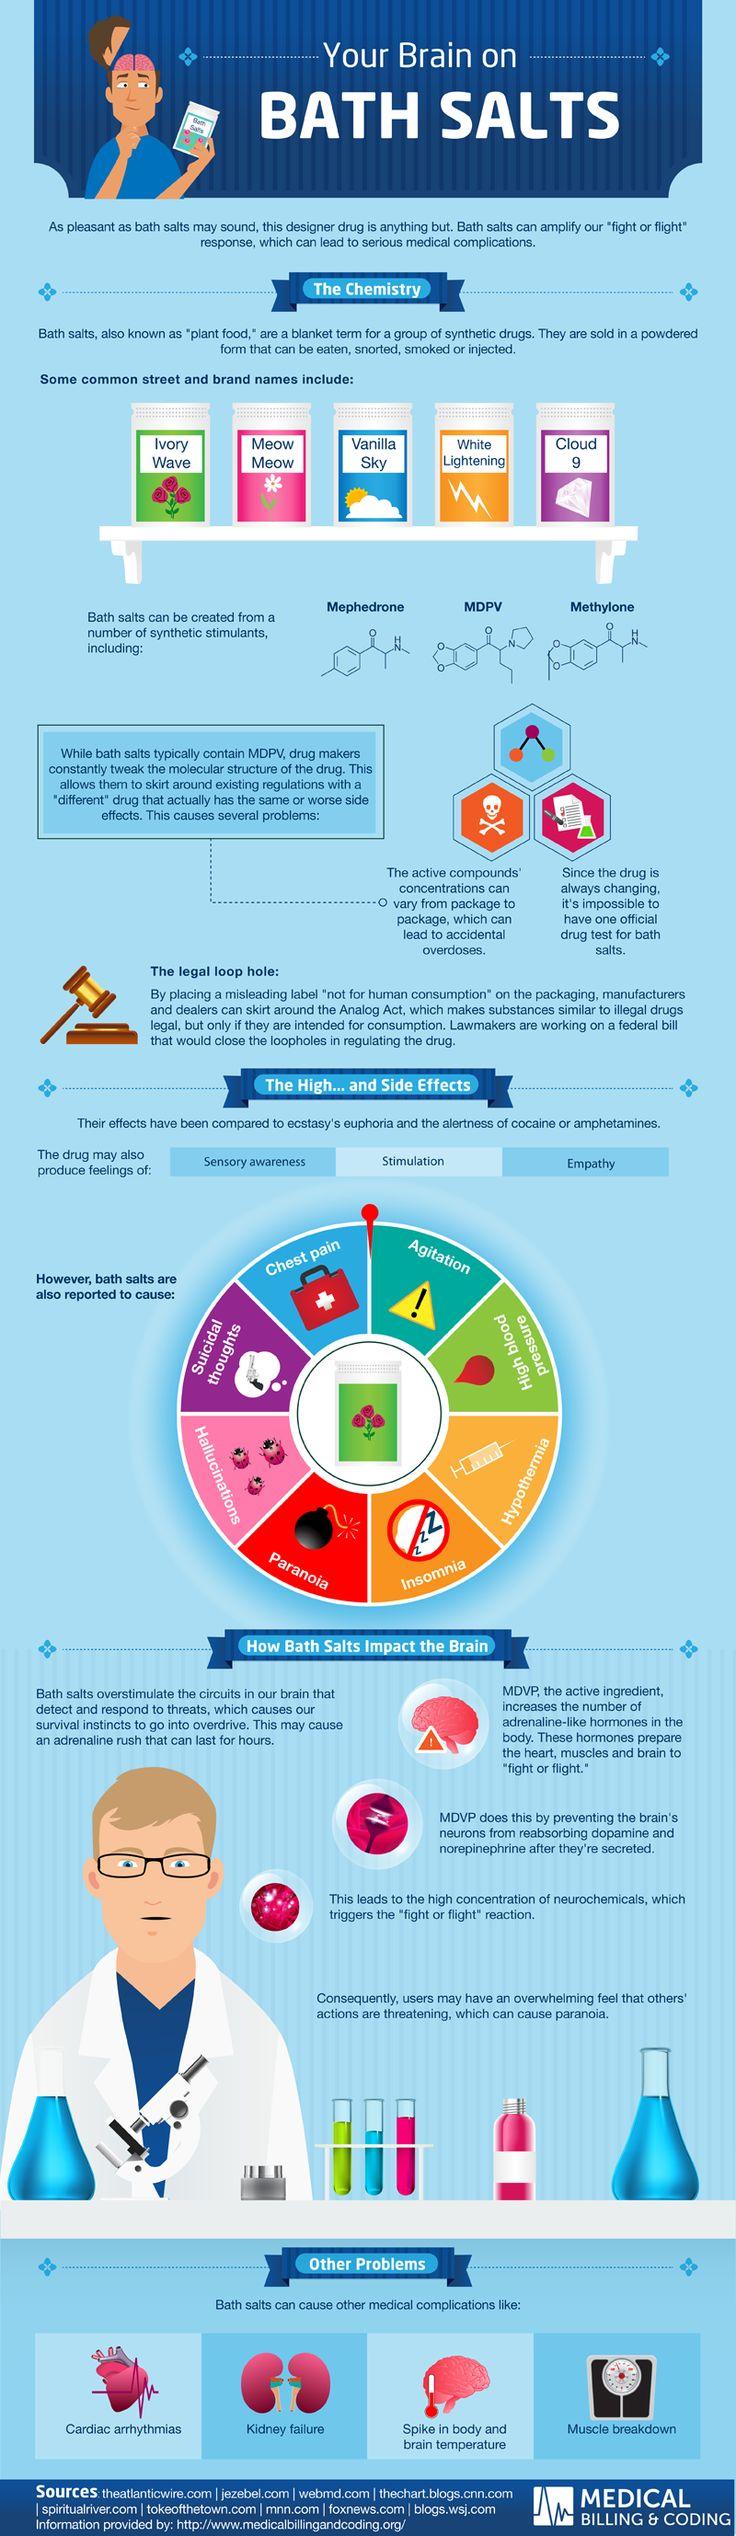 Your Brain On Bath Salts Infographic